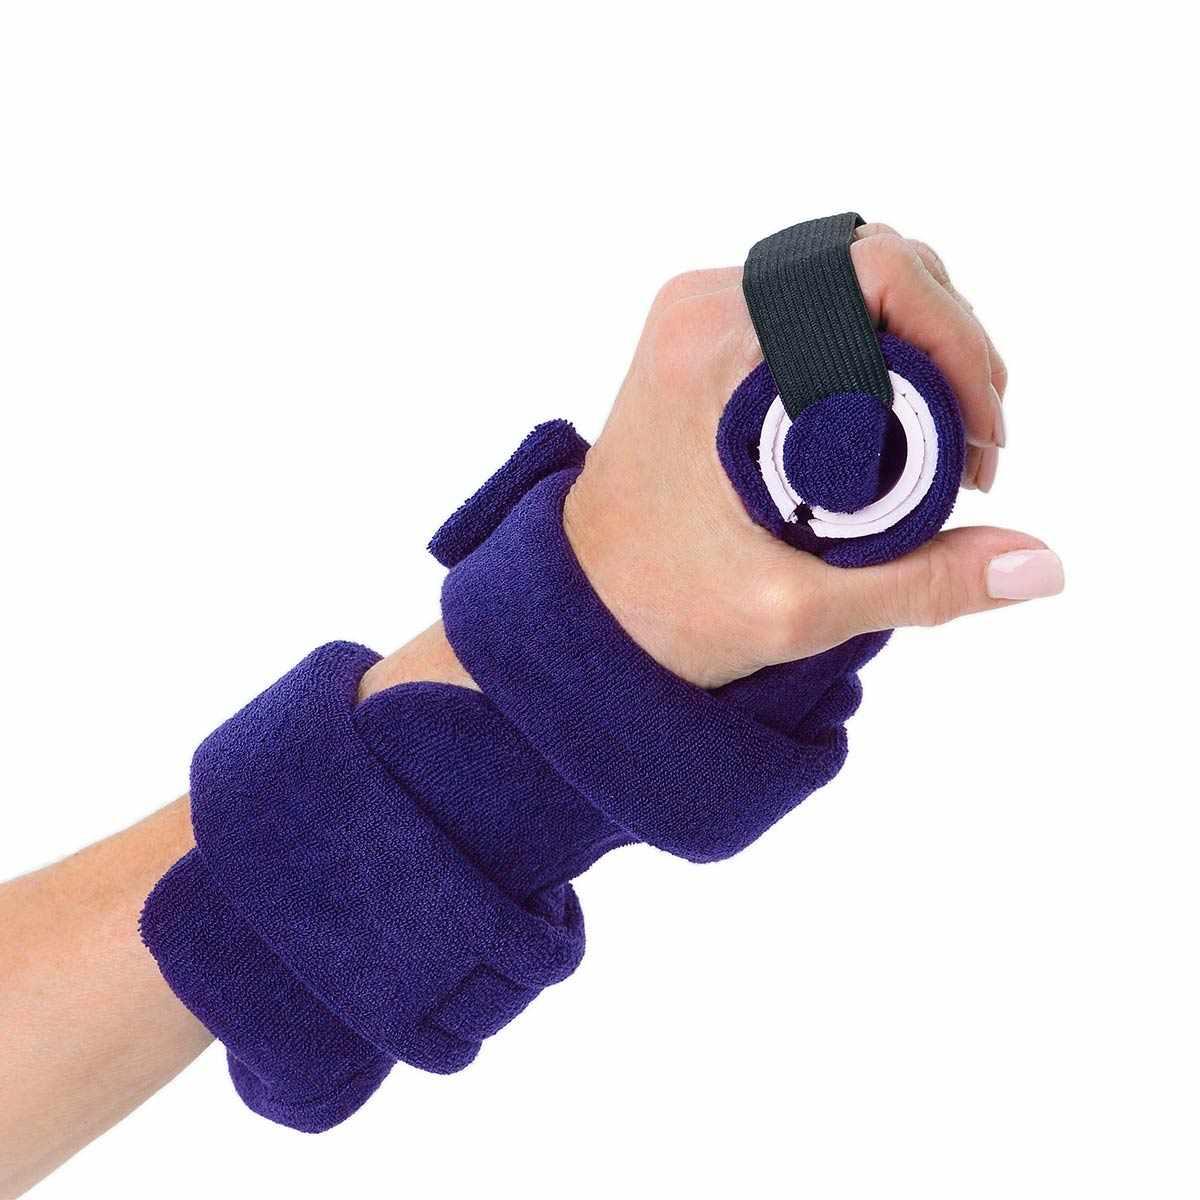 Comfy pediatric finger extender orthosis